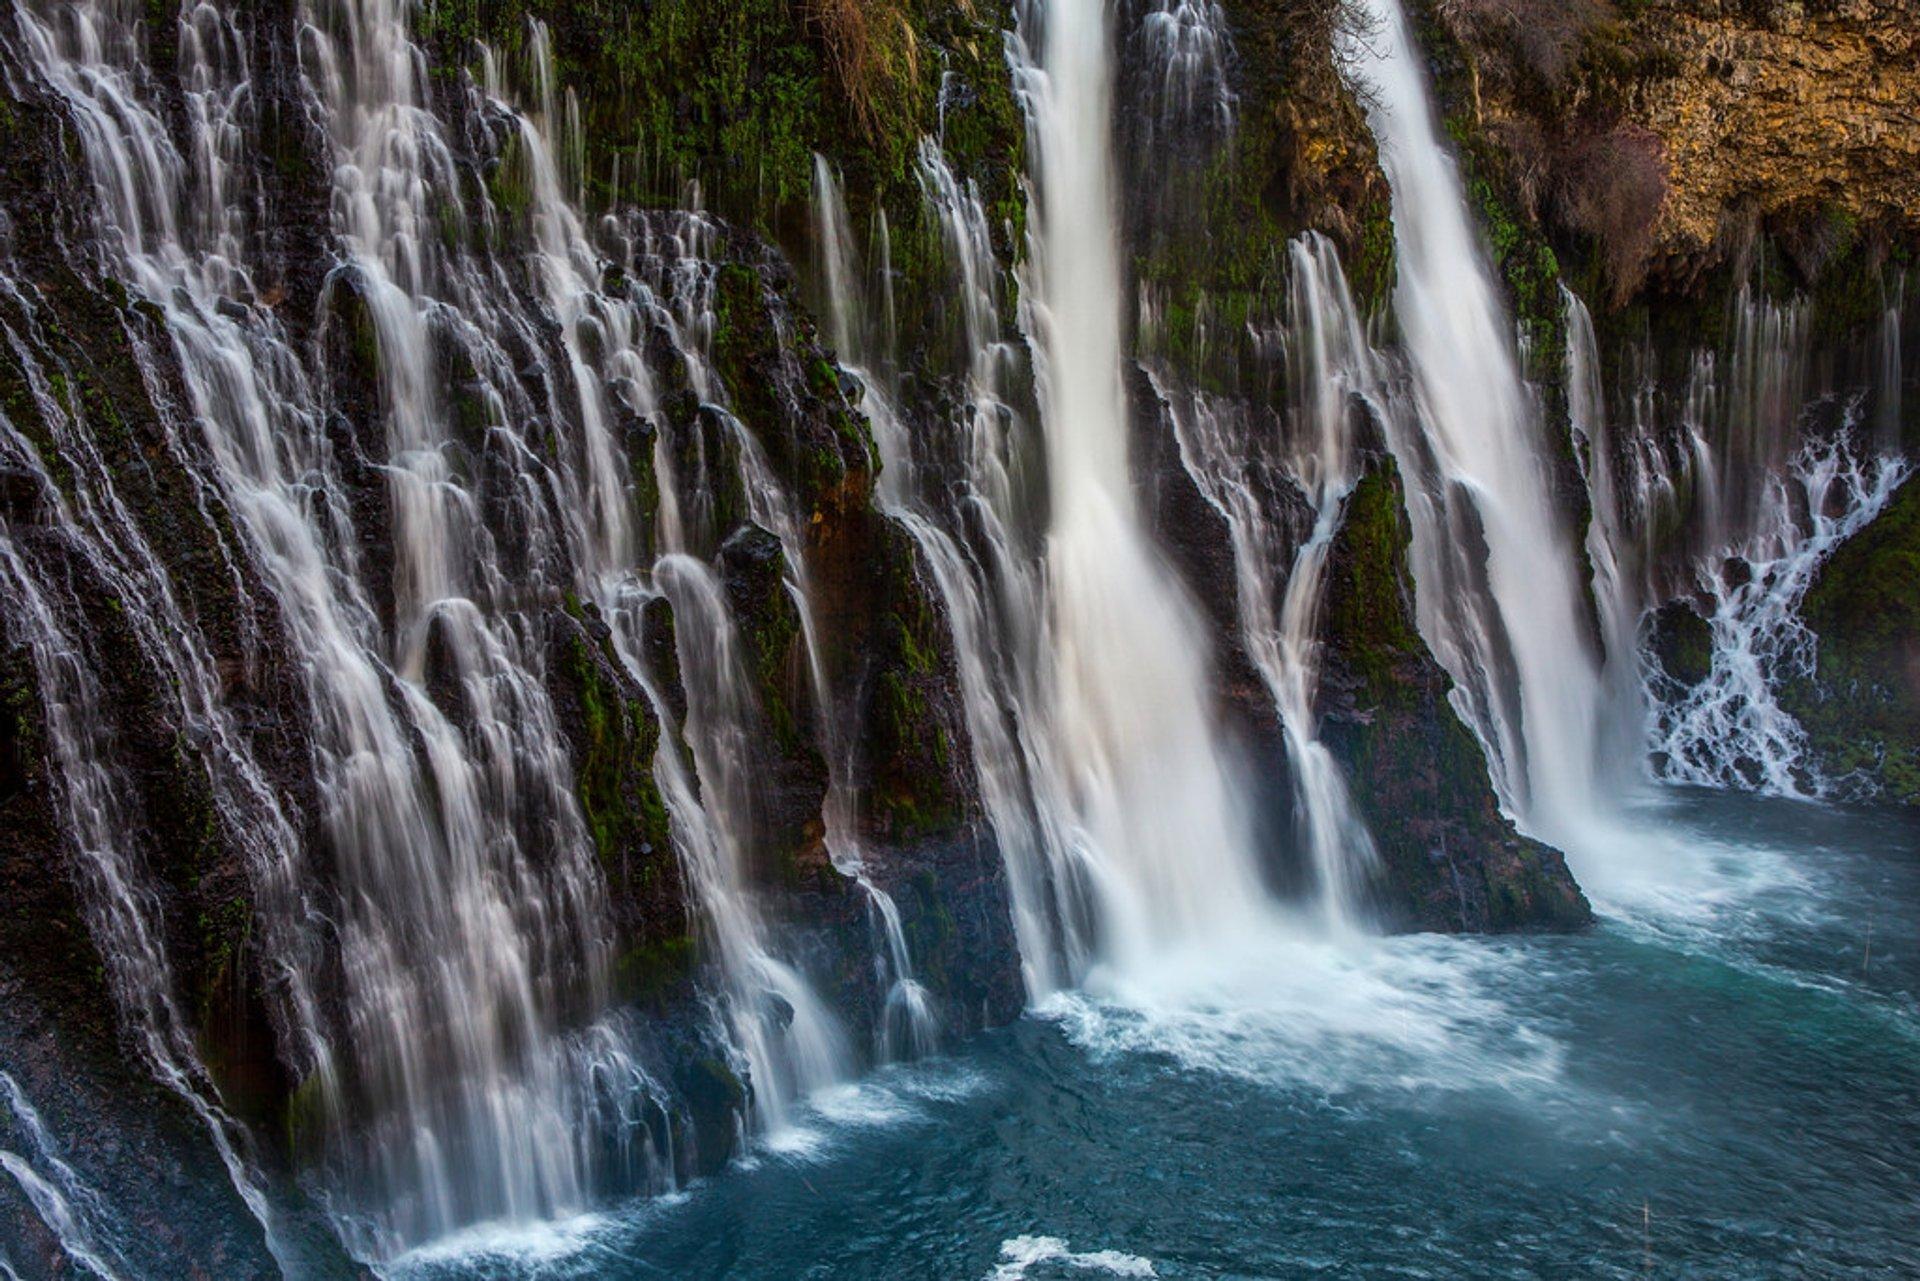 Burney Falls in California - Best Season 2020